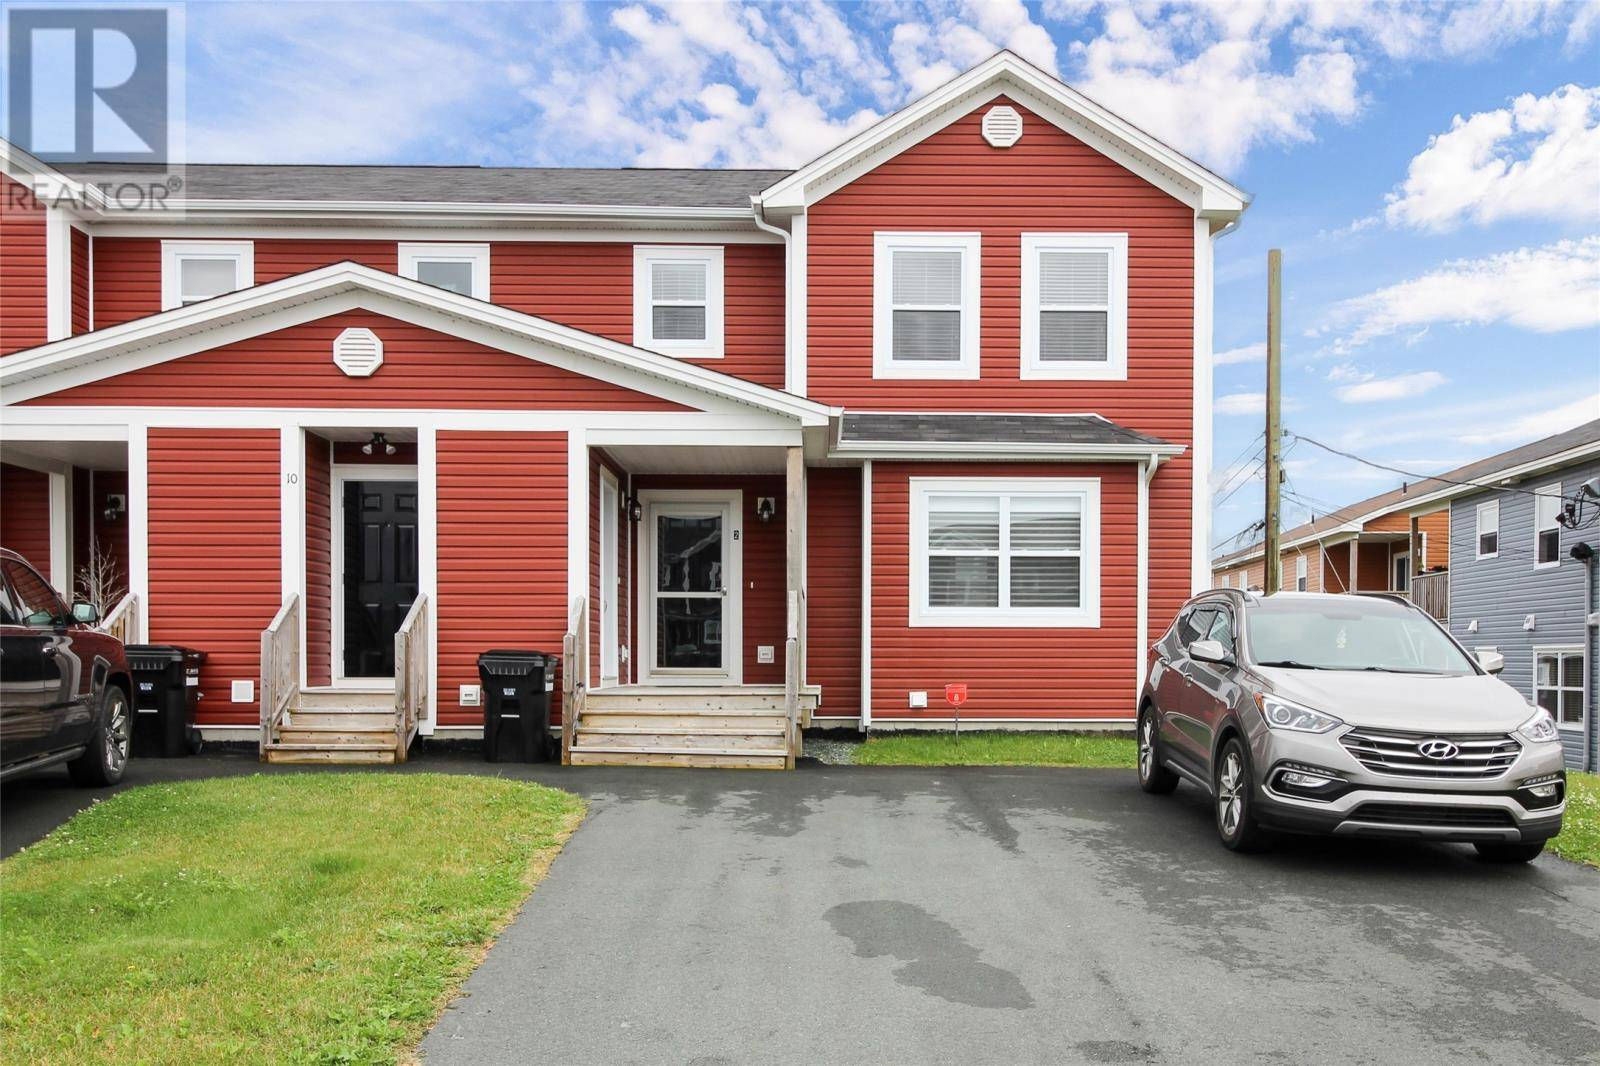 House for sale at 10 Guernsey Pl Unit 2 St. John's Newfoundland - MLS: 1201213